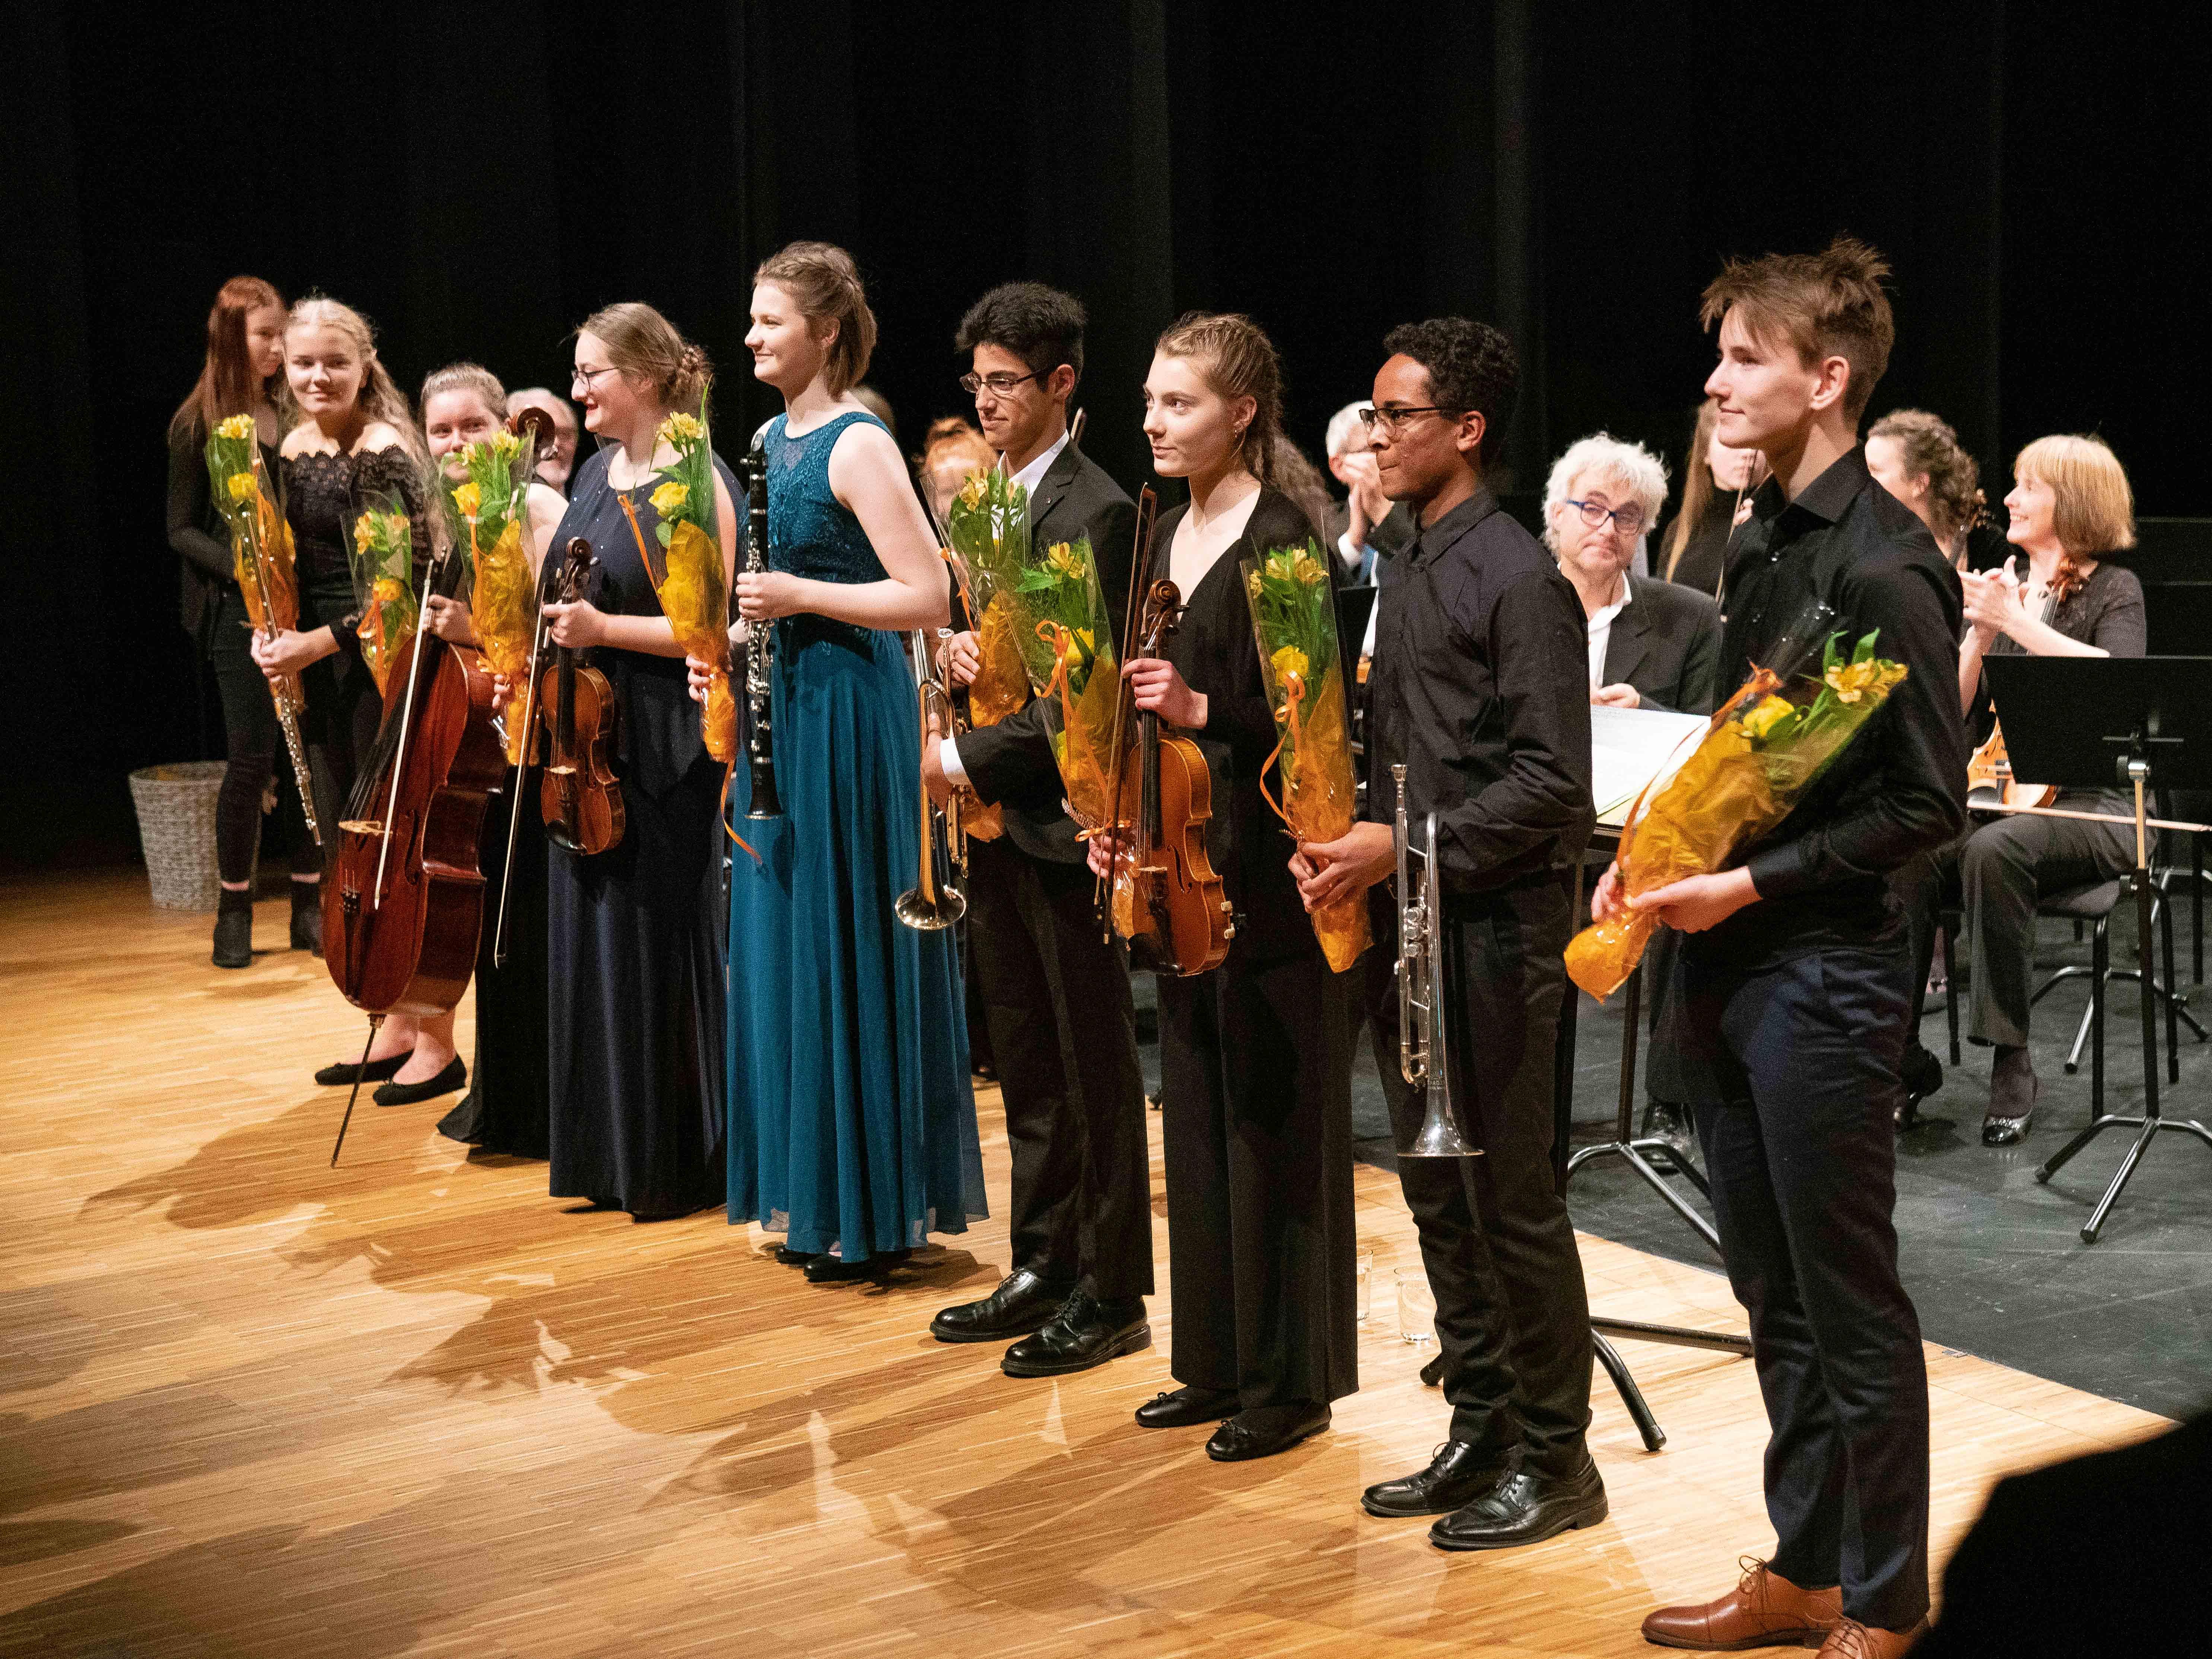 Stor suksess for åtte unge solister